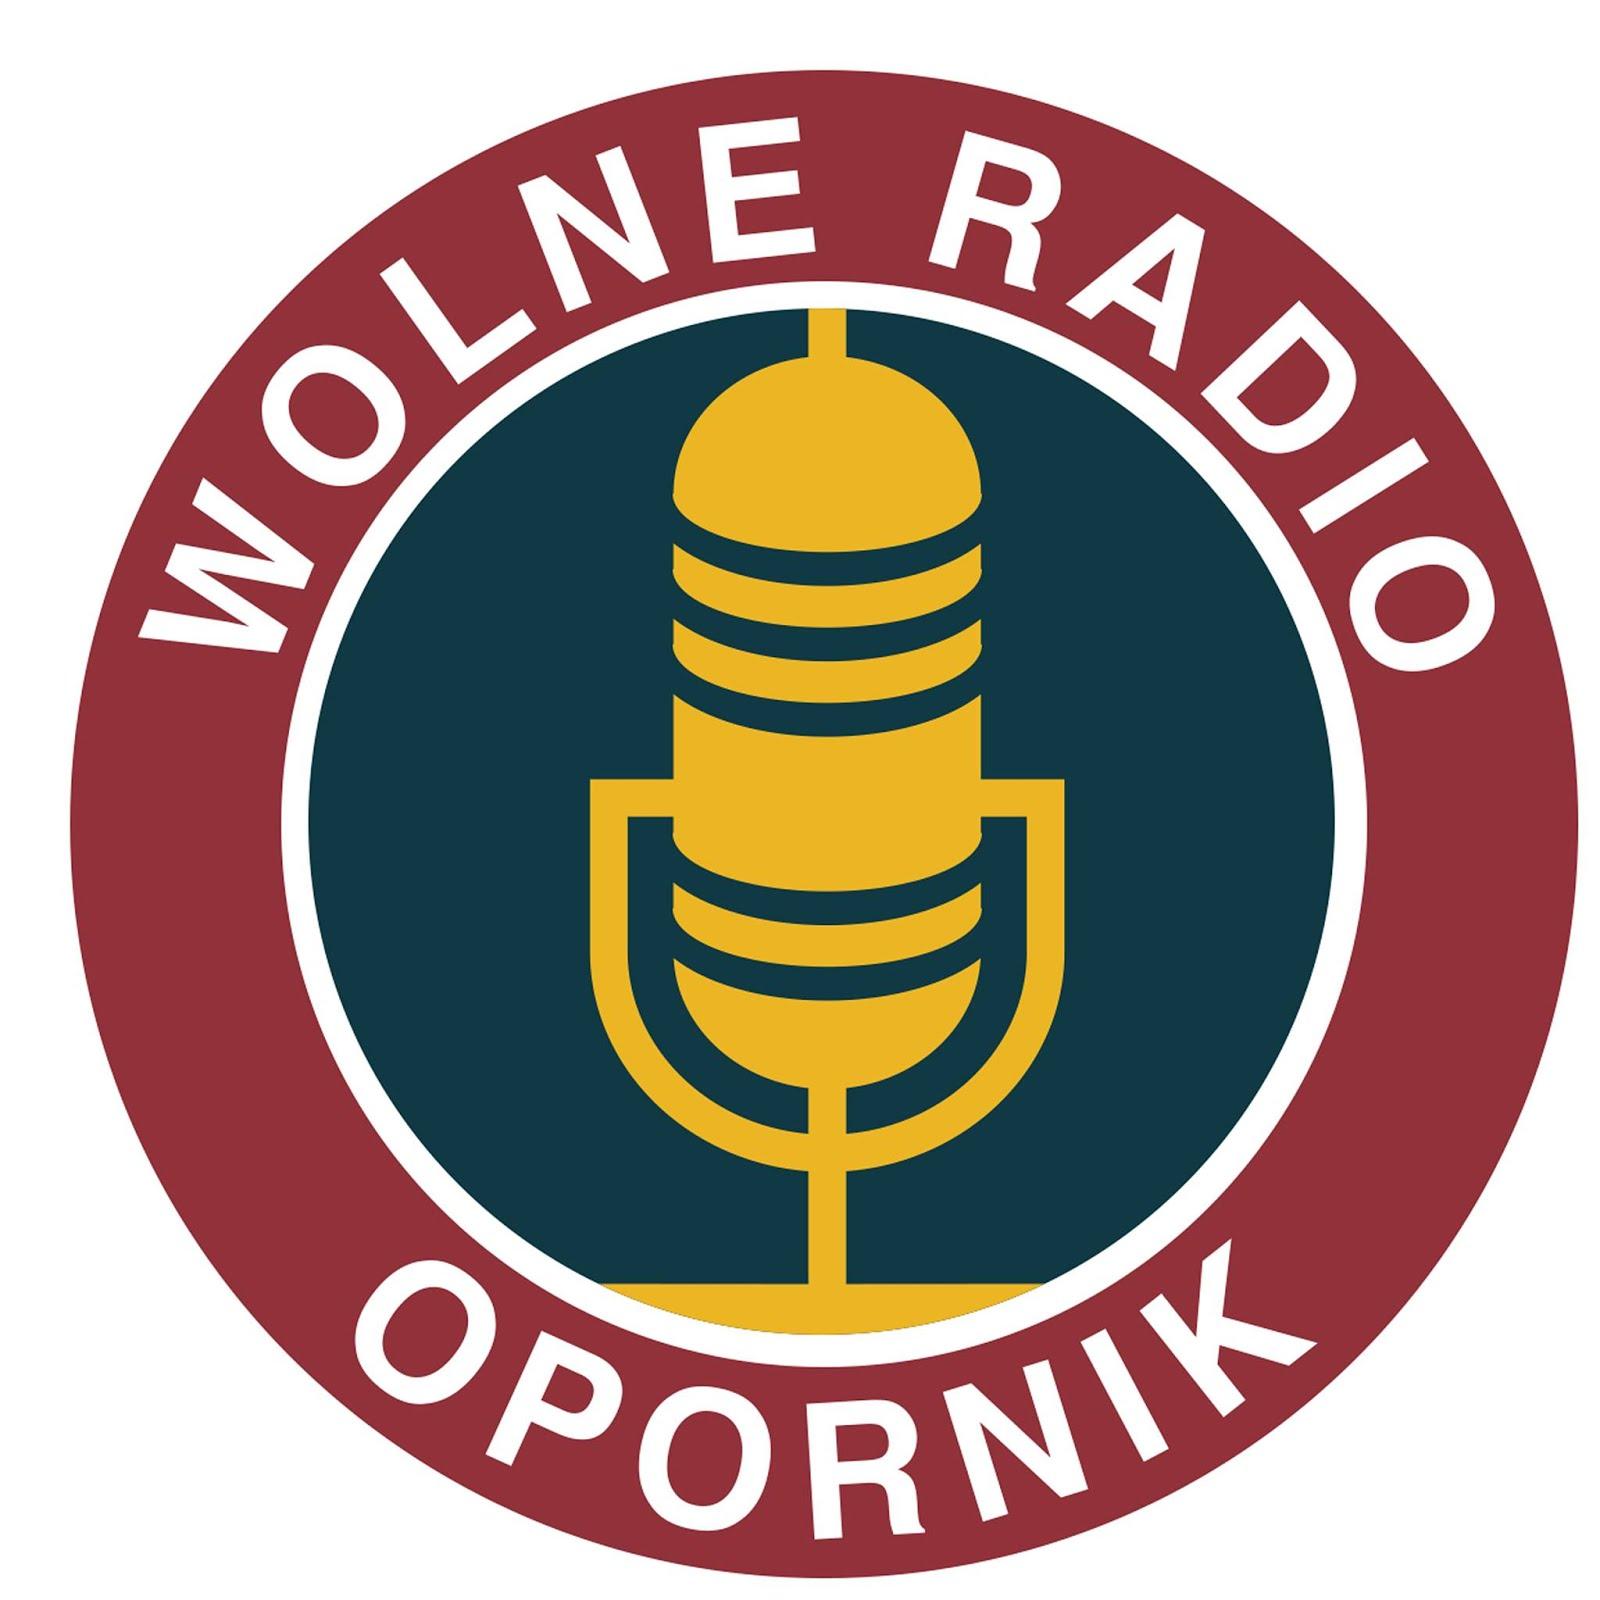 Wolne Radio Opornik